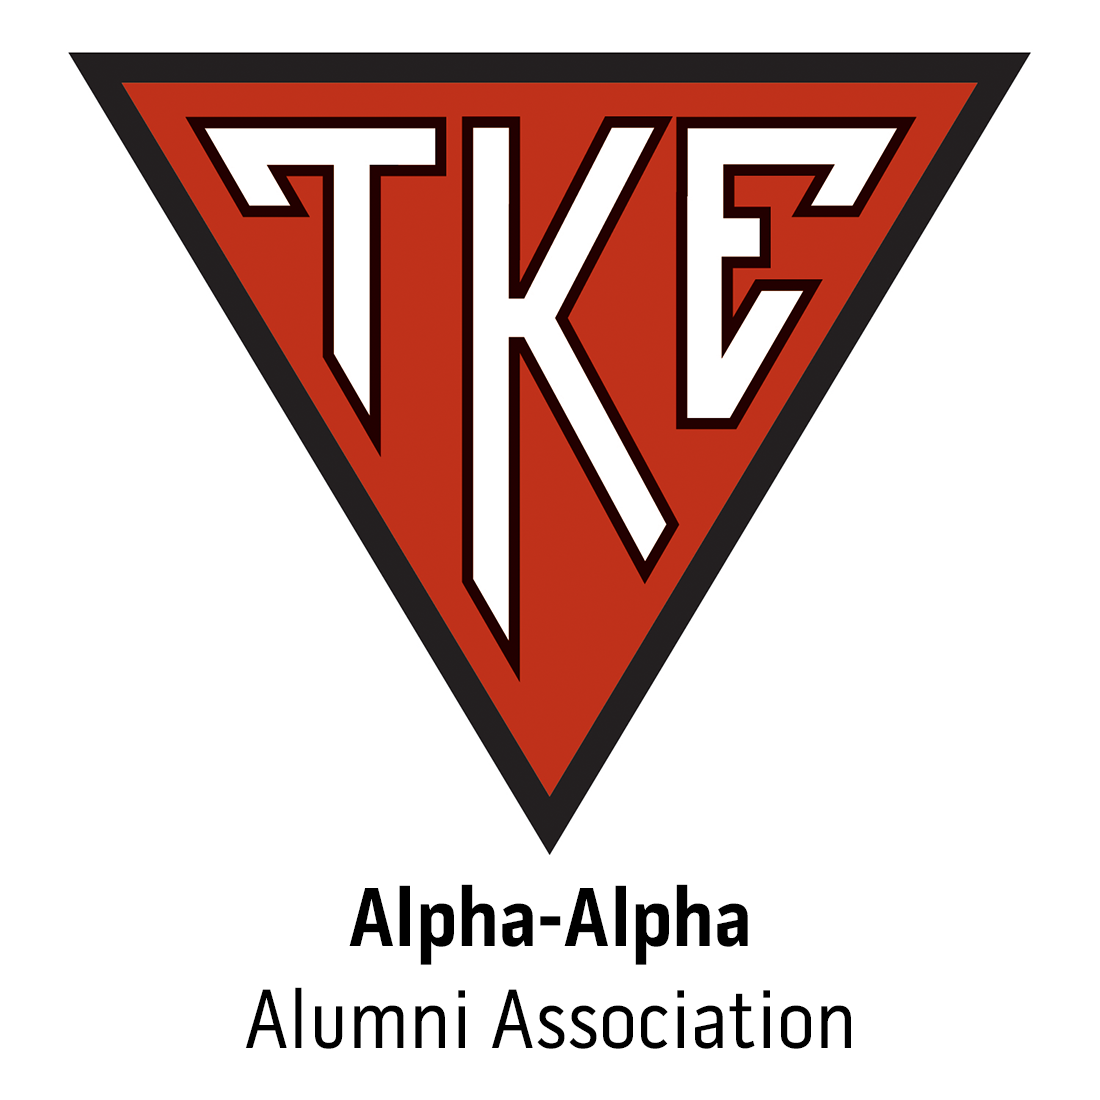 Alpha-Alpha Alumni Association at Wabash College